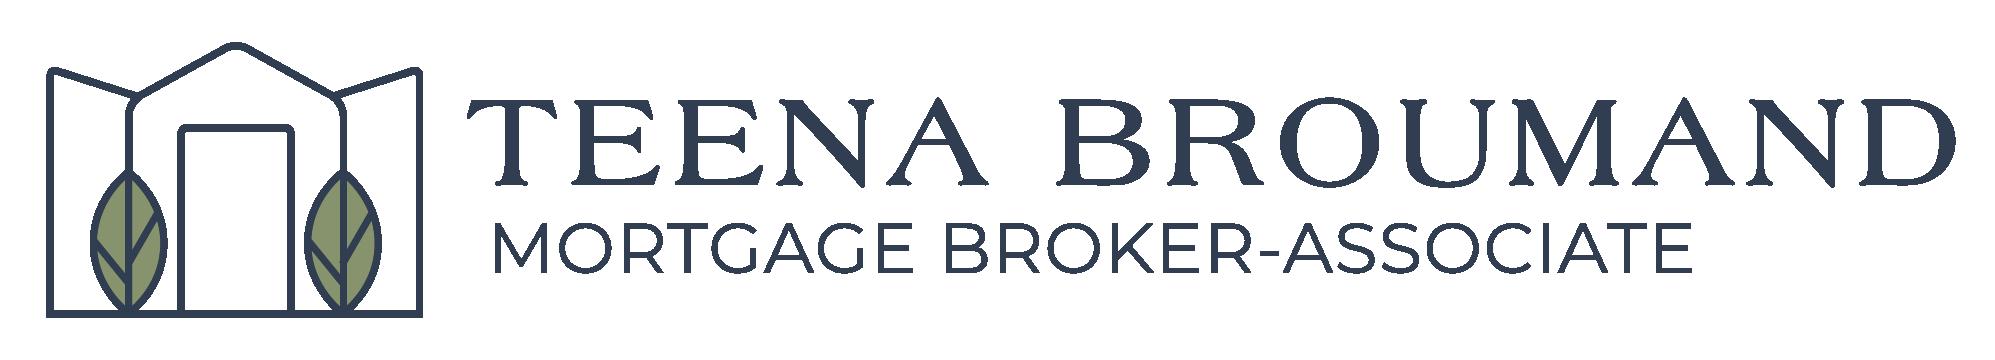 teena broumand mortgage broker associate